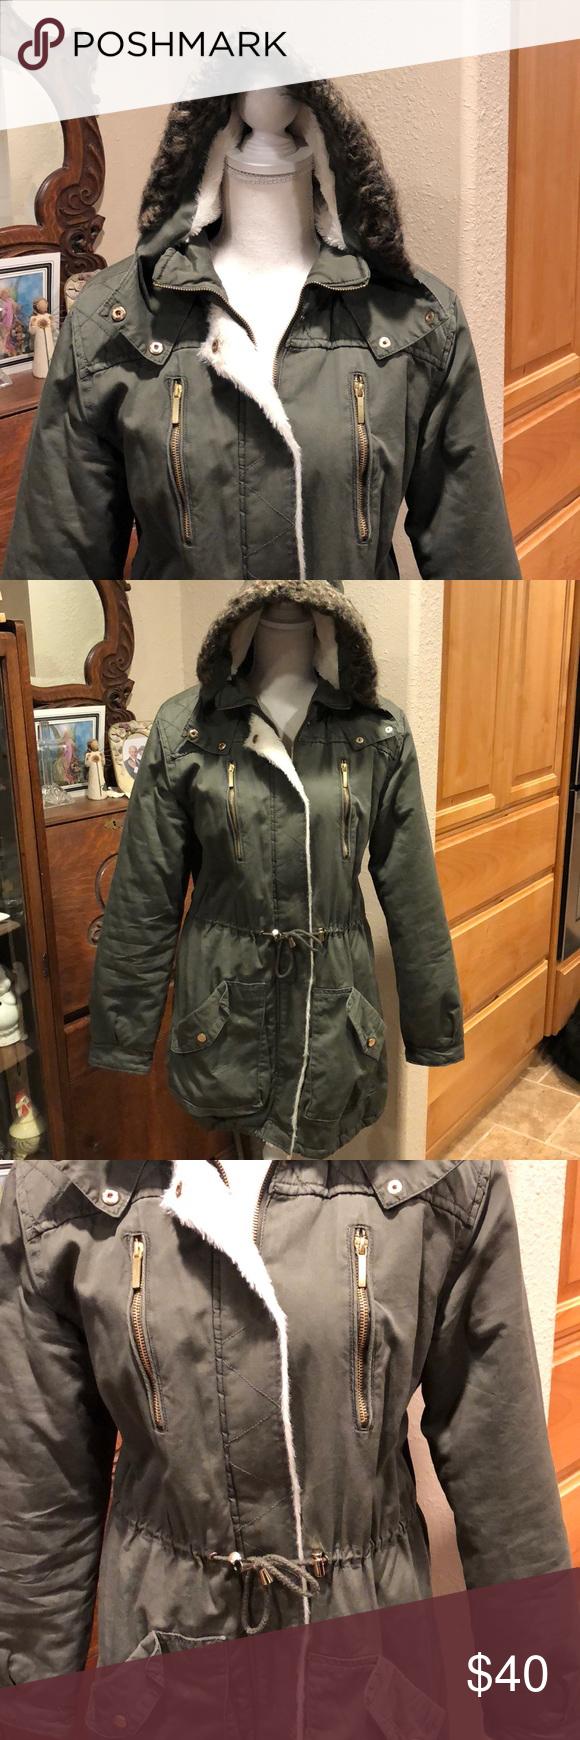 Yoki Outerwear Collection Jacket Fashion Clothes Design Jackets [ 1740 x 580 Pixel ]